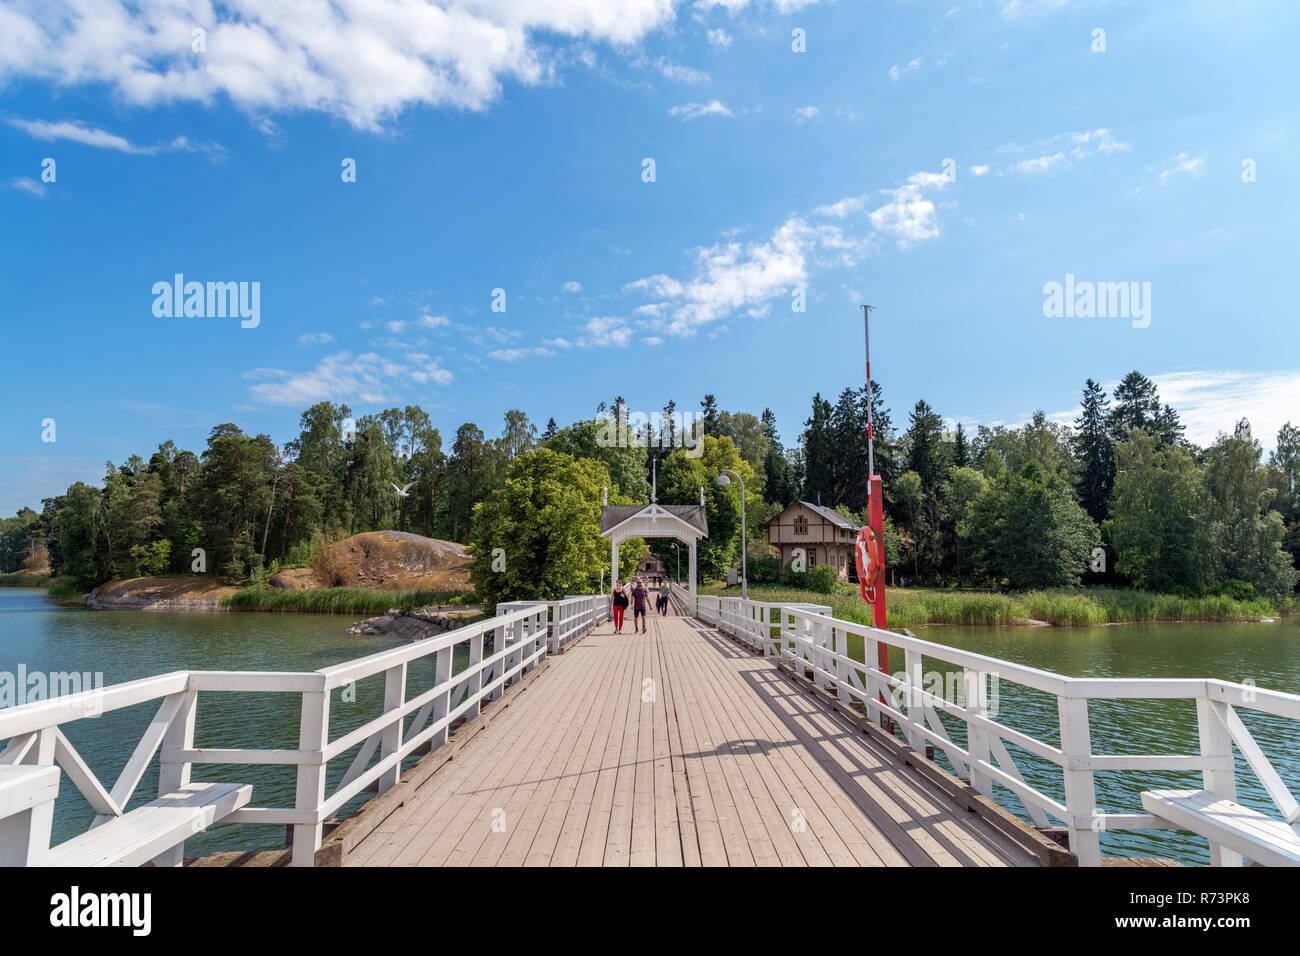 The bridge across to Seurasaari Open-Air Museum, Seurasaari, Helsinki, Finland. - Stock Image